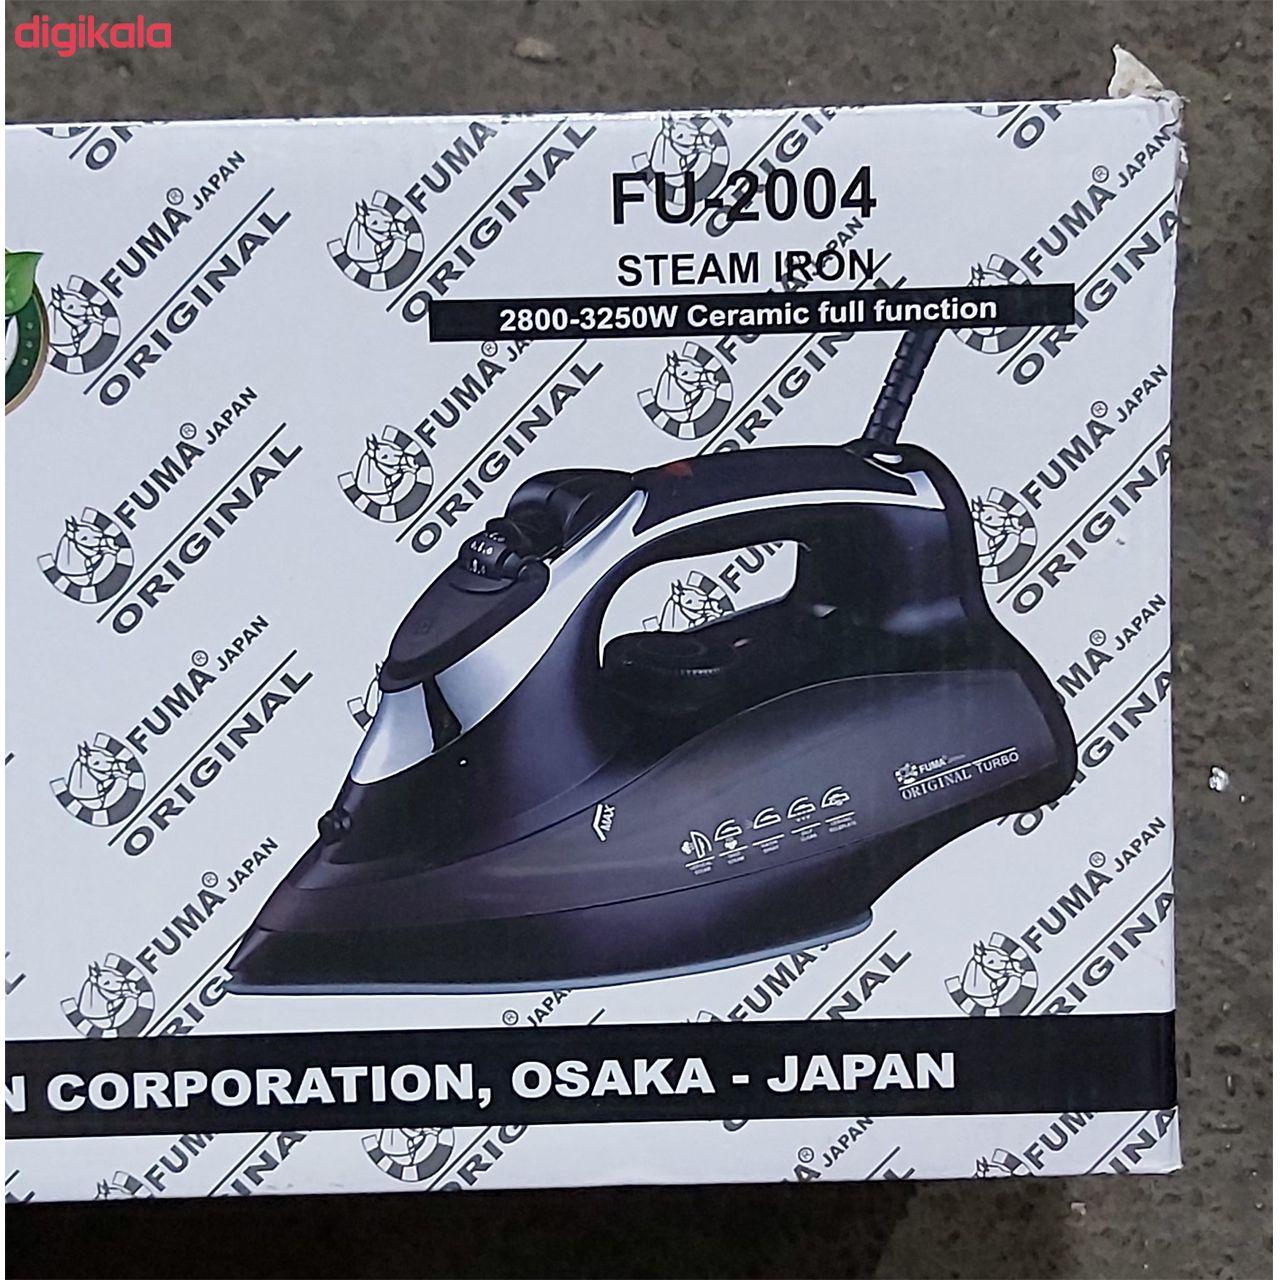 اتو بخار فوما مدل 2004 main 1 8